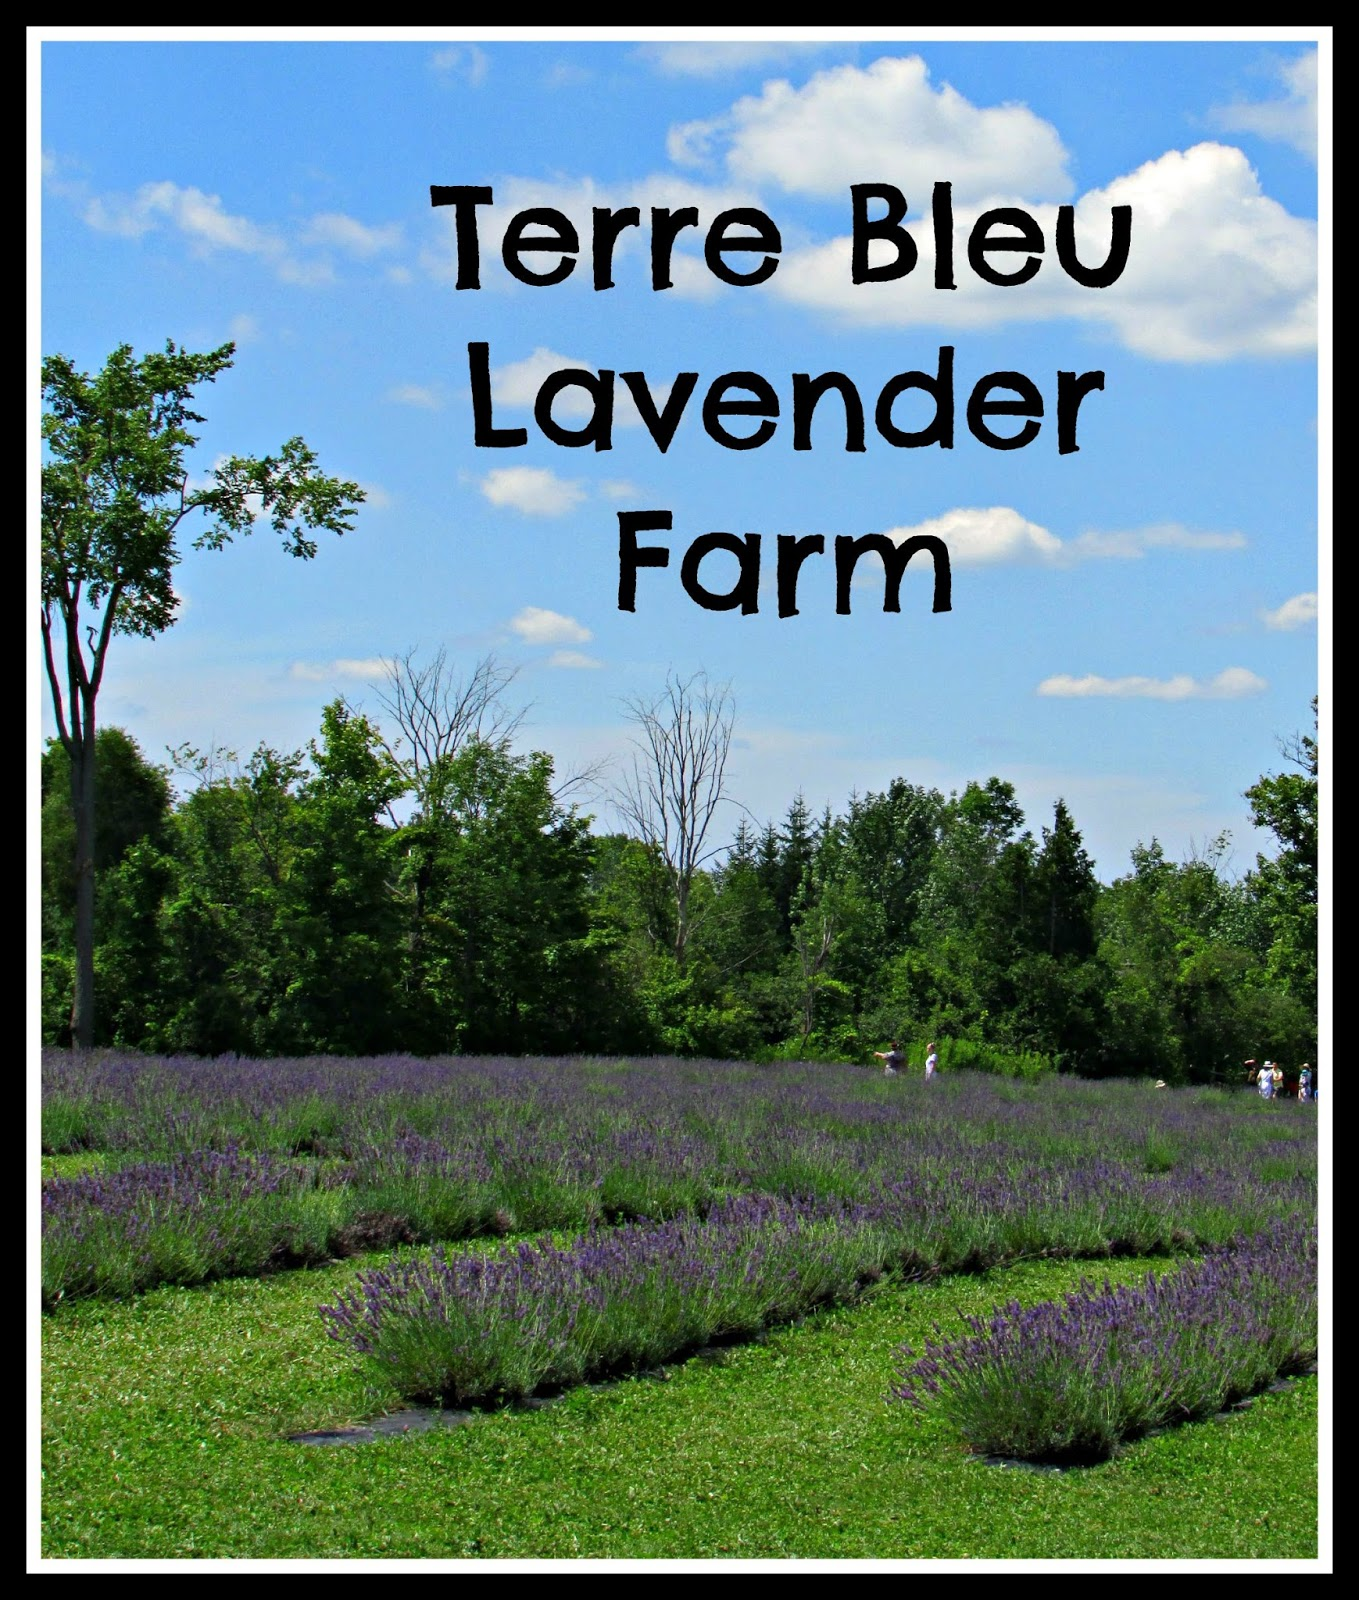 Queen B - Creative Me: A Visit to Terre Bleu Lavender Farm